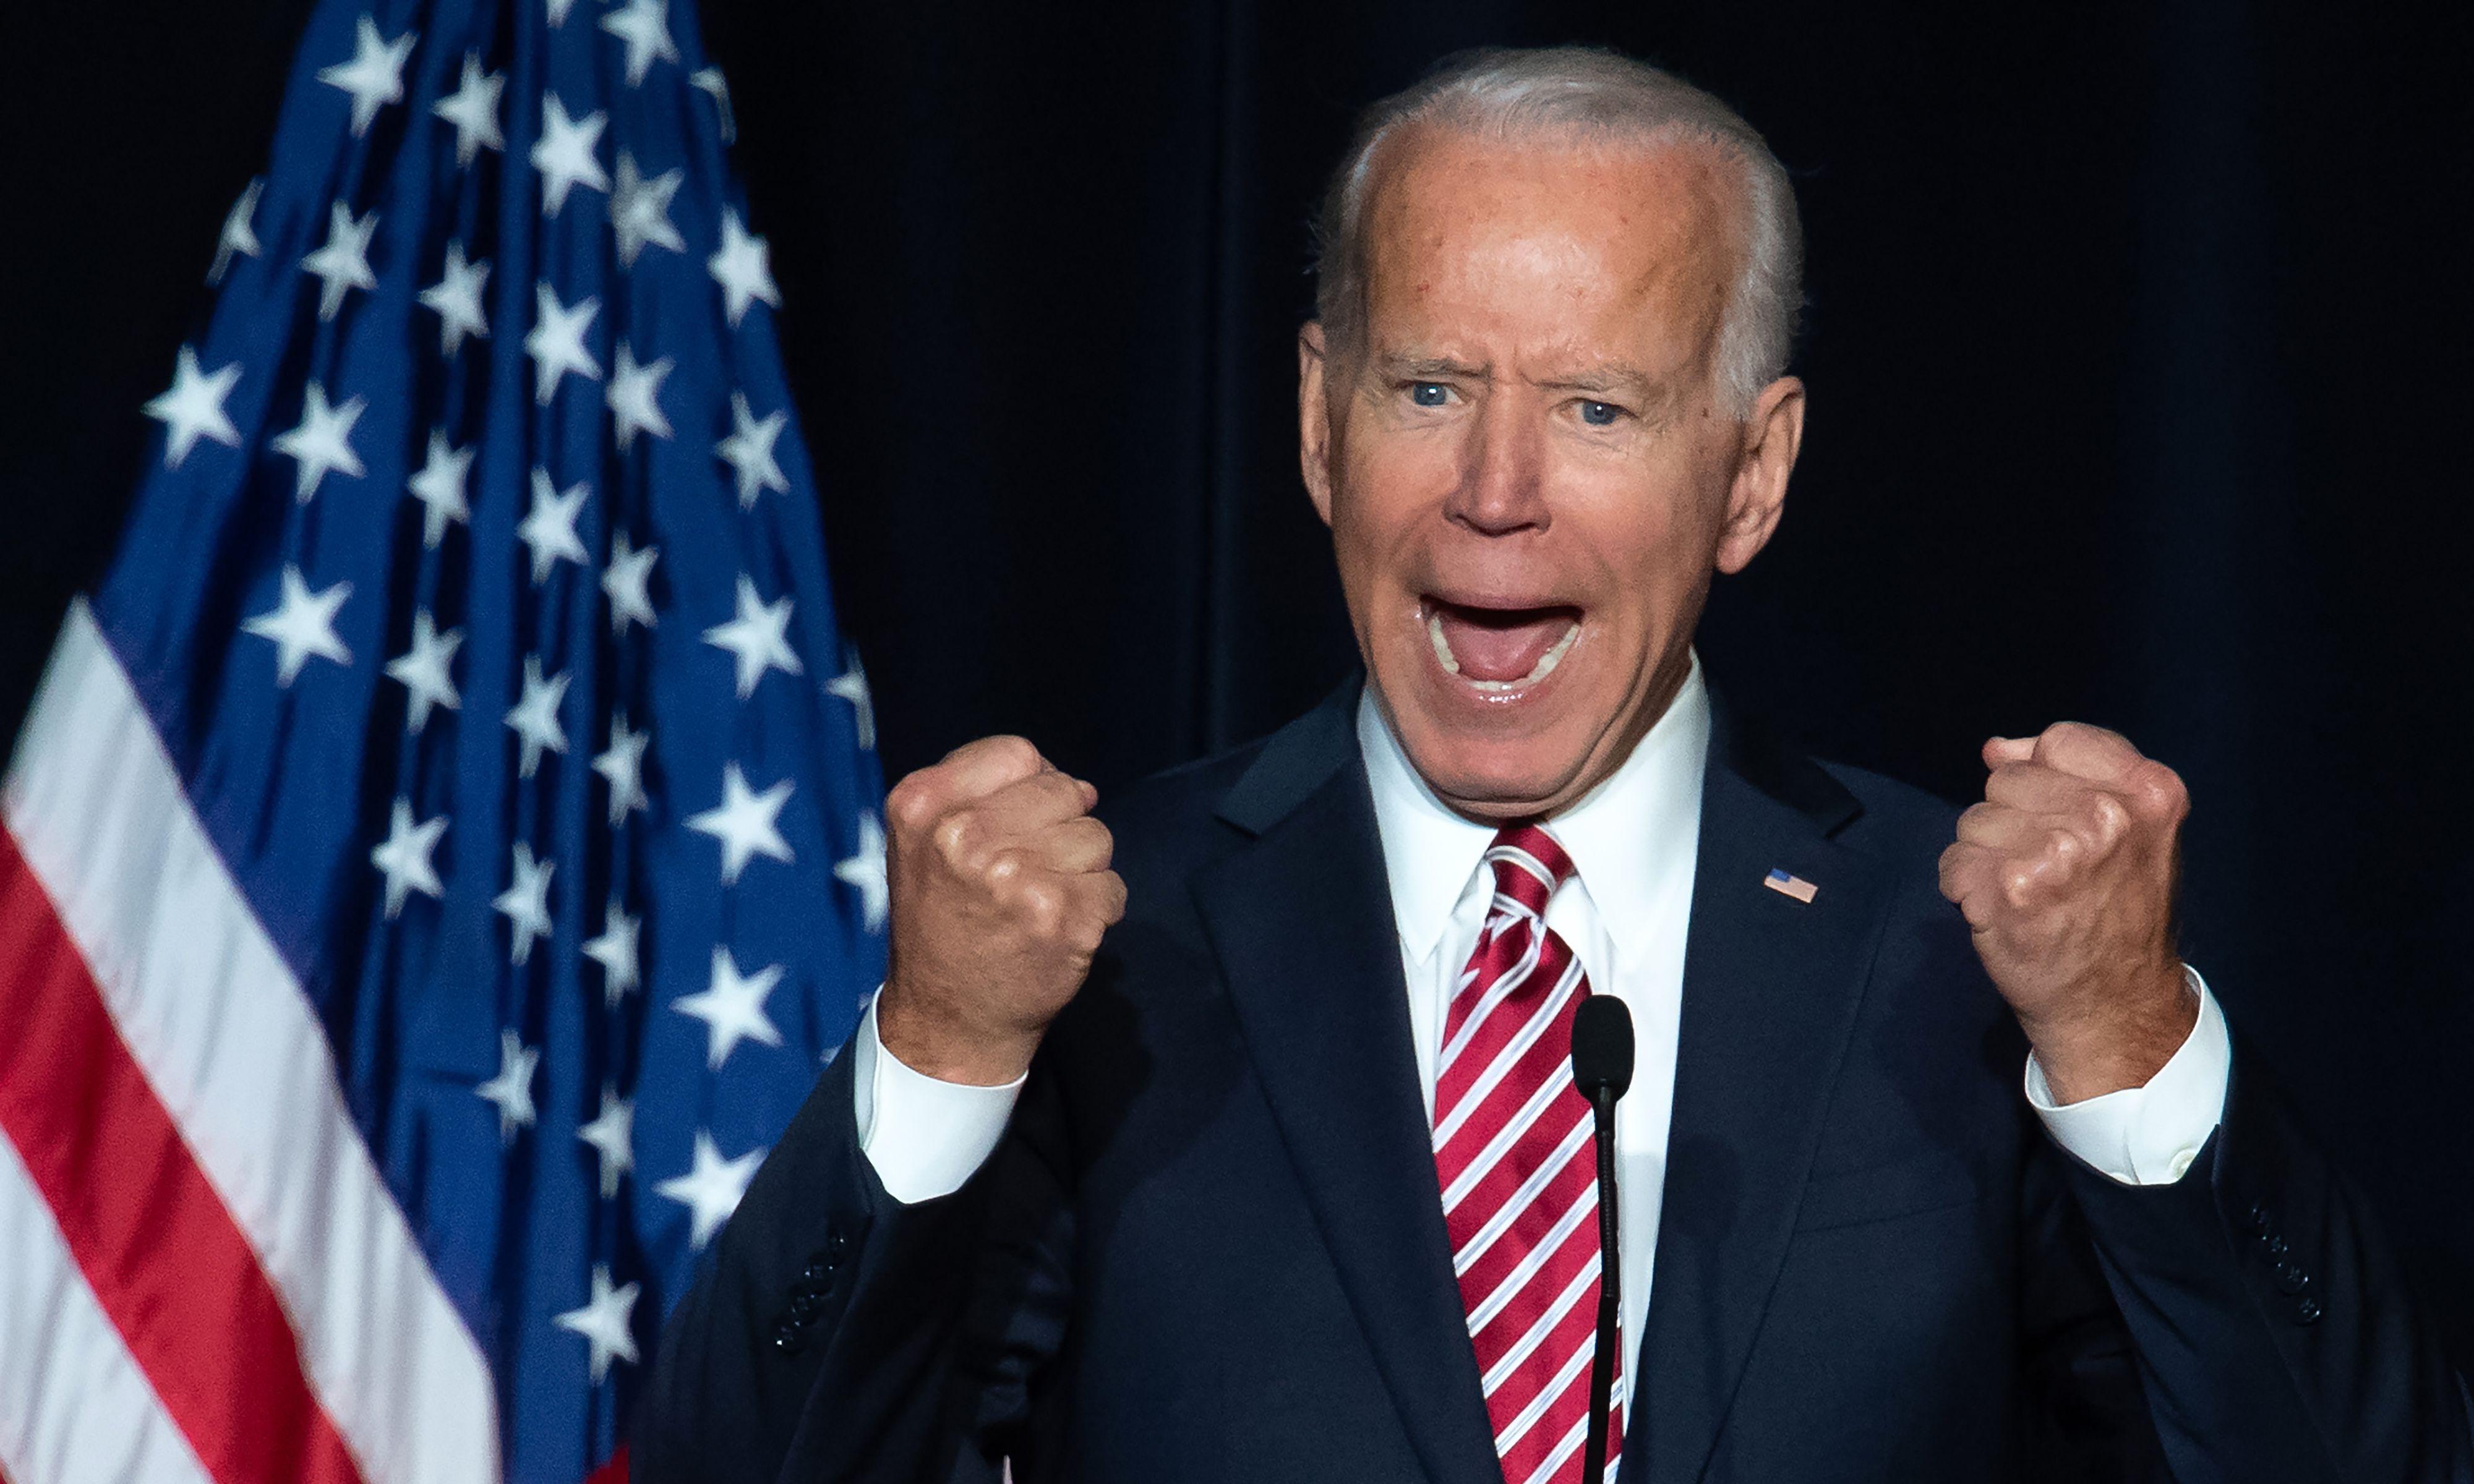 Joe Biden raises $6.3m in a day, surpassing Democratic 2020 rivals